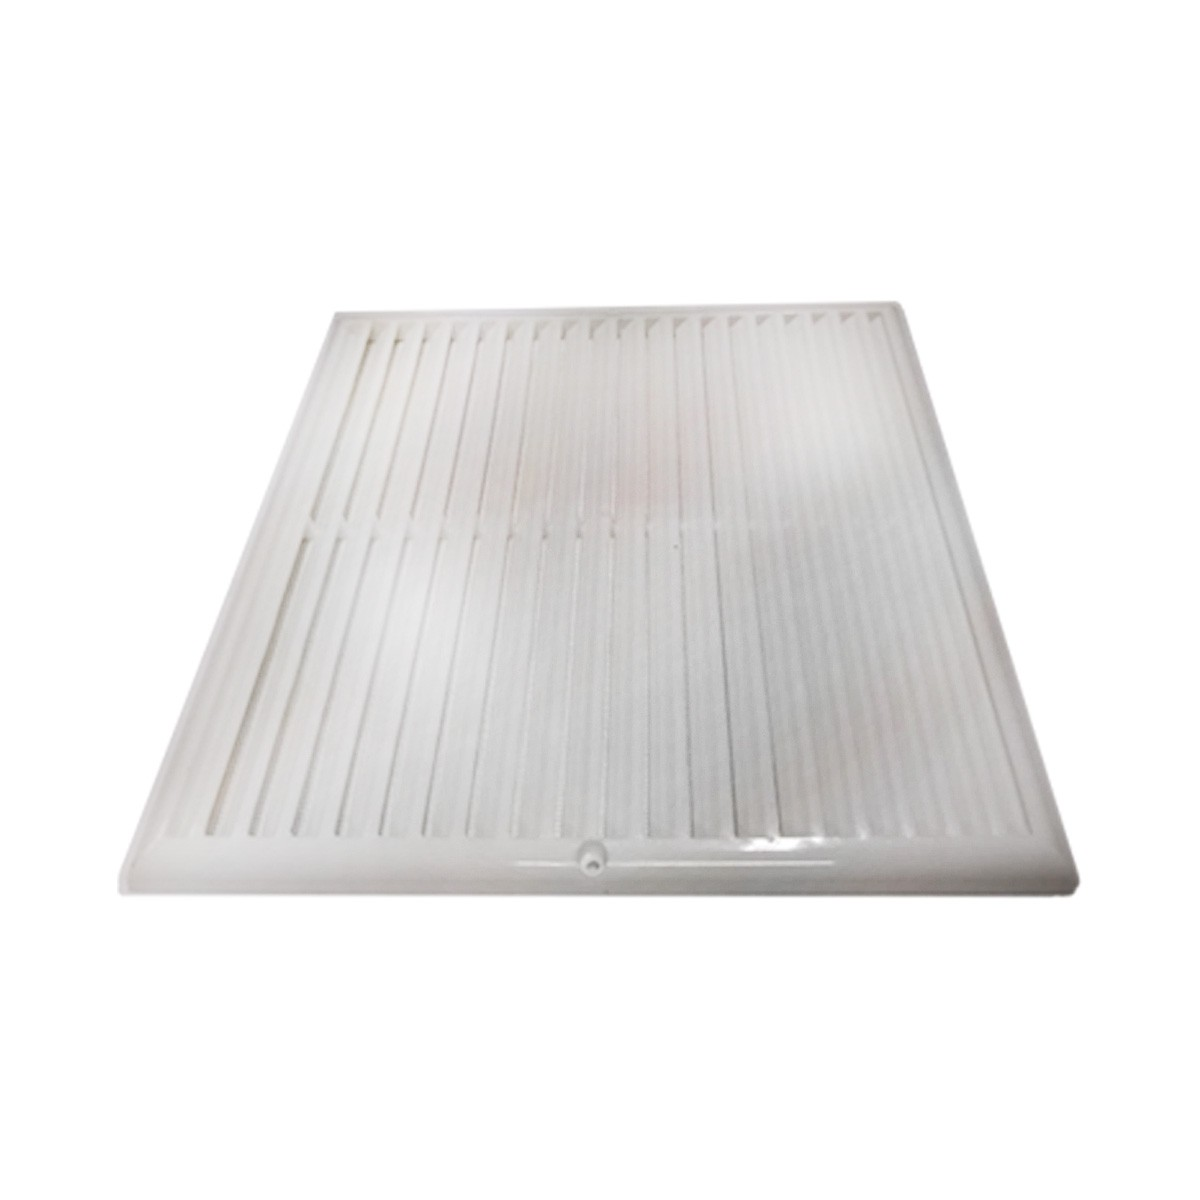 Grade Ventilacao 200x200mm Sobrepor Global Plastic